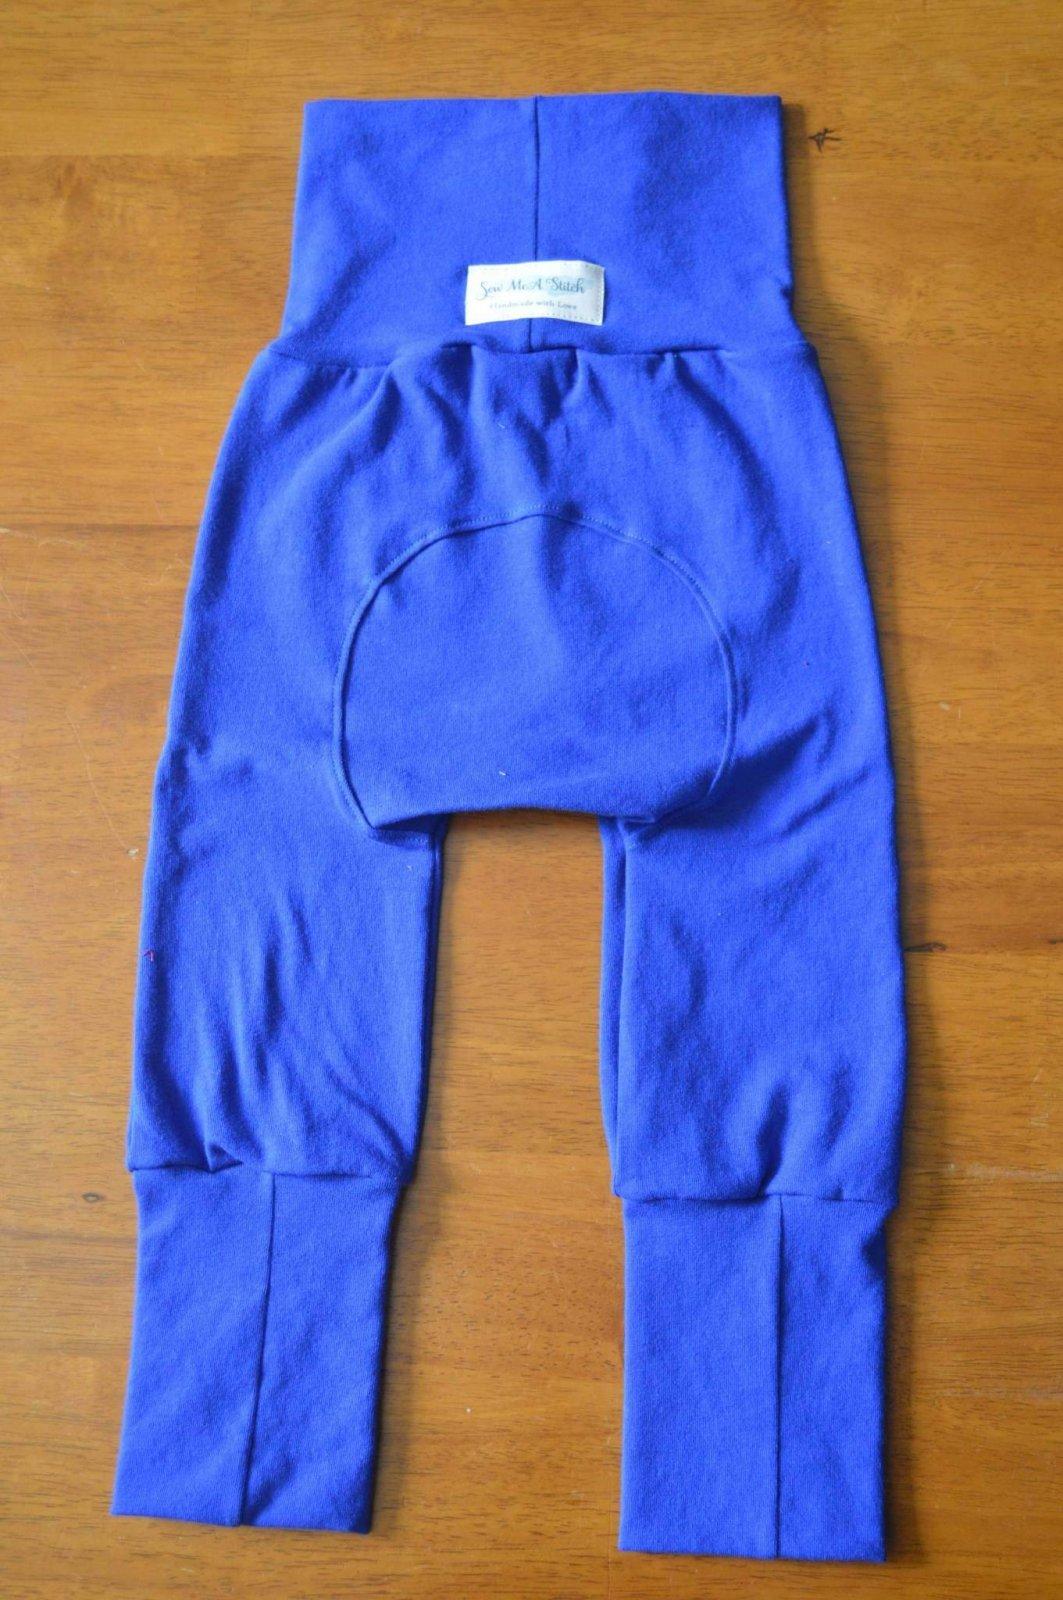 Sew MeA Stitch Maxaloones Solids